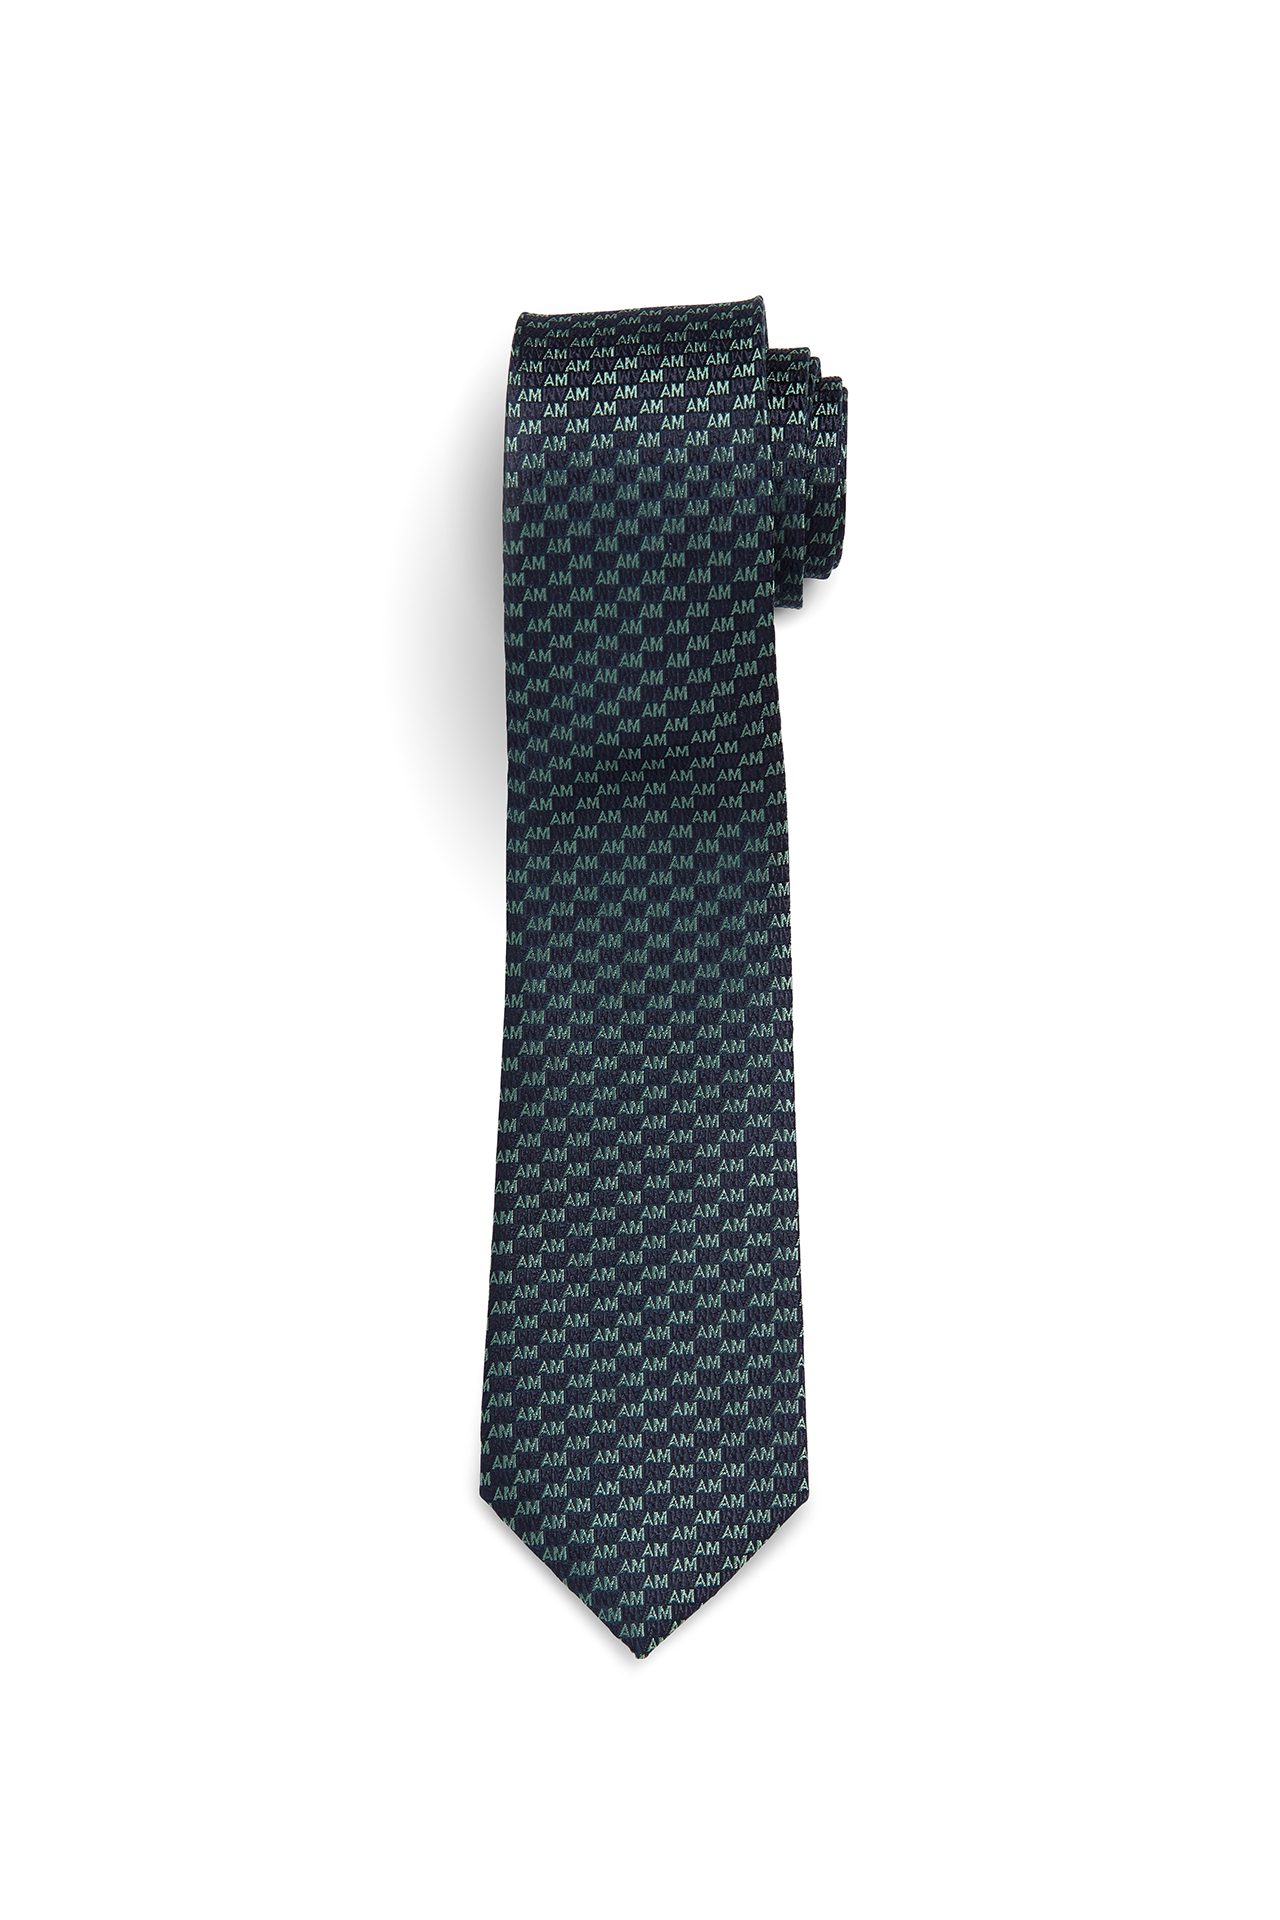 AM Check Navy Green Tie